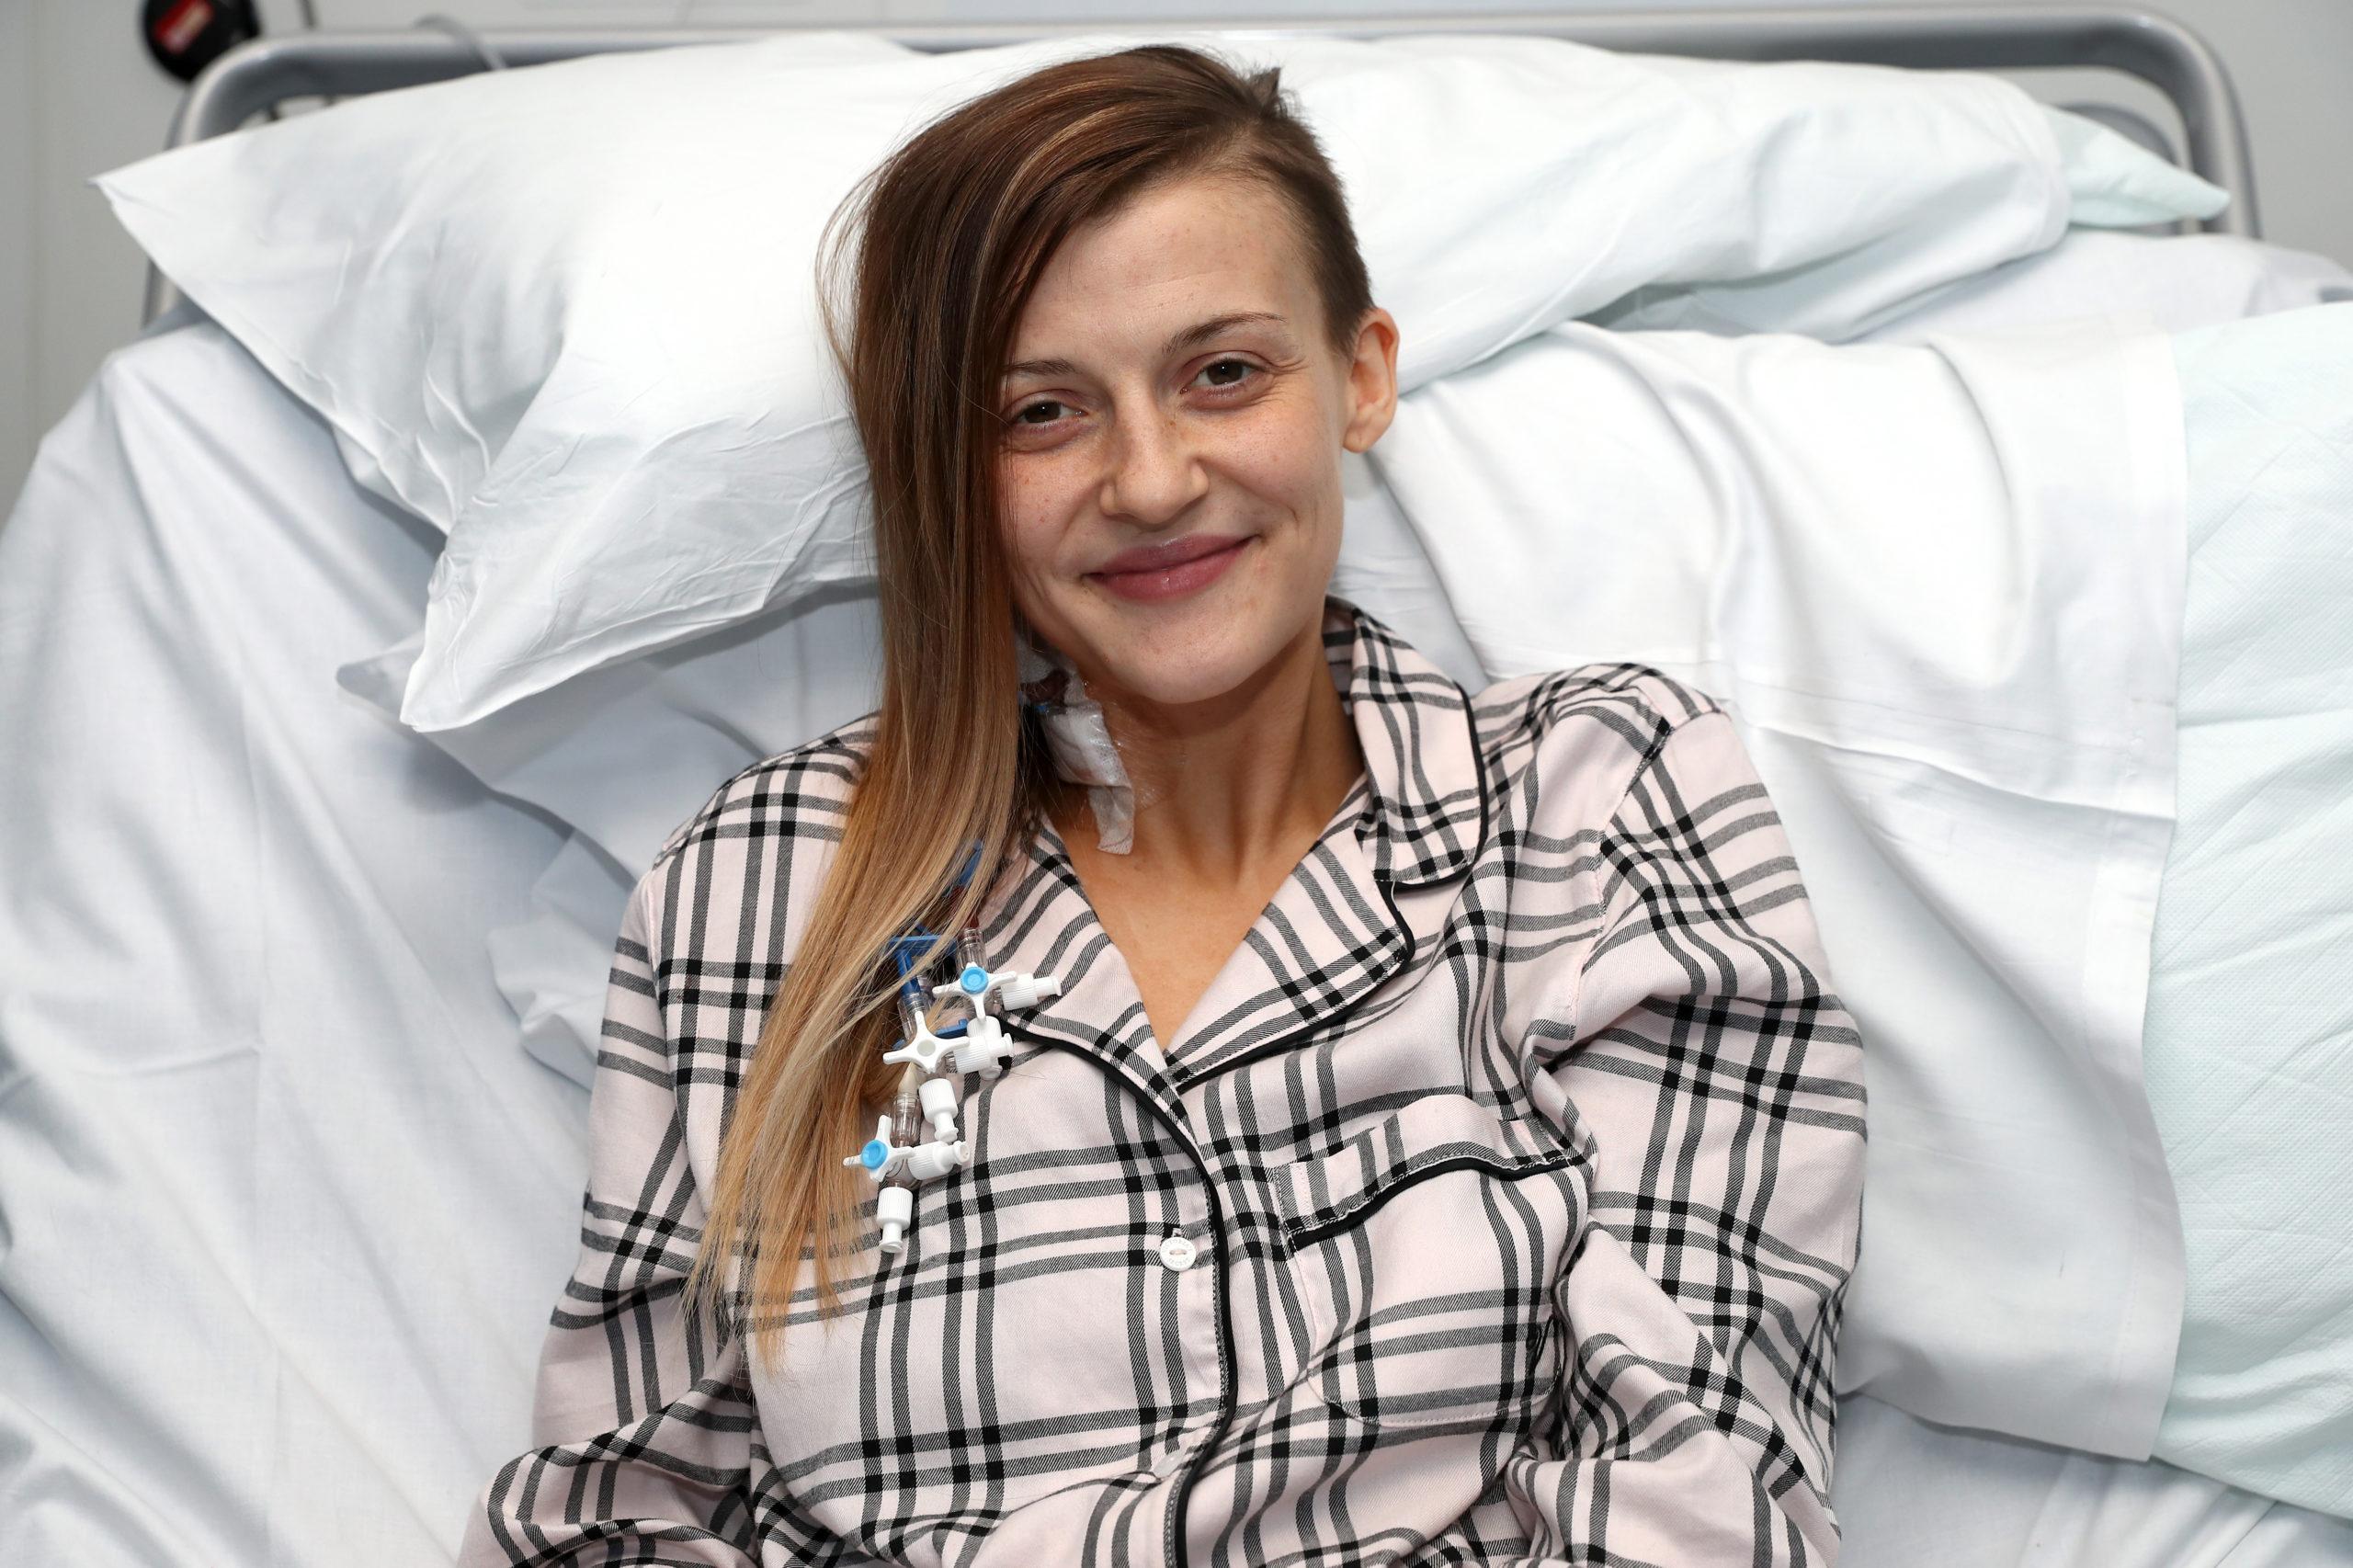 Jenna Cameron after the liver transplant in Birmingham